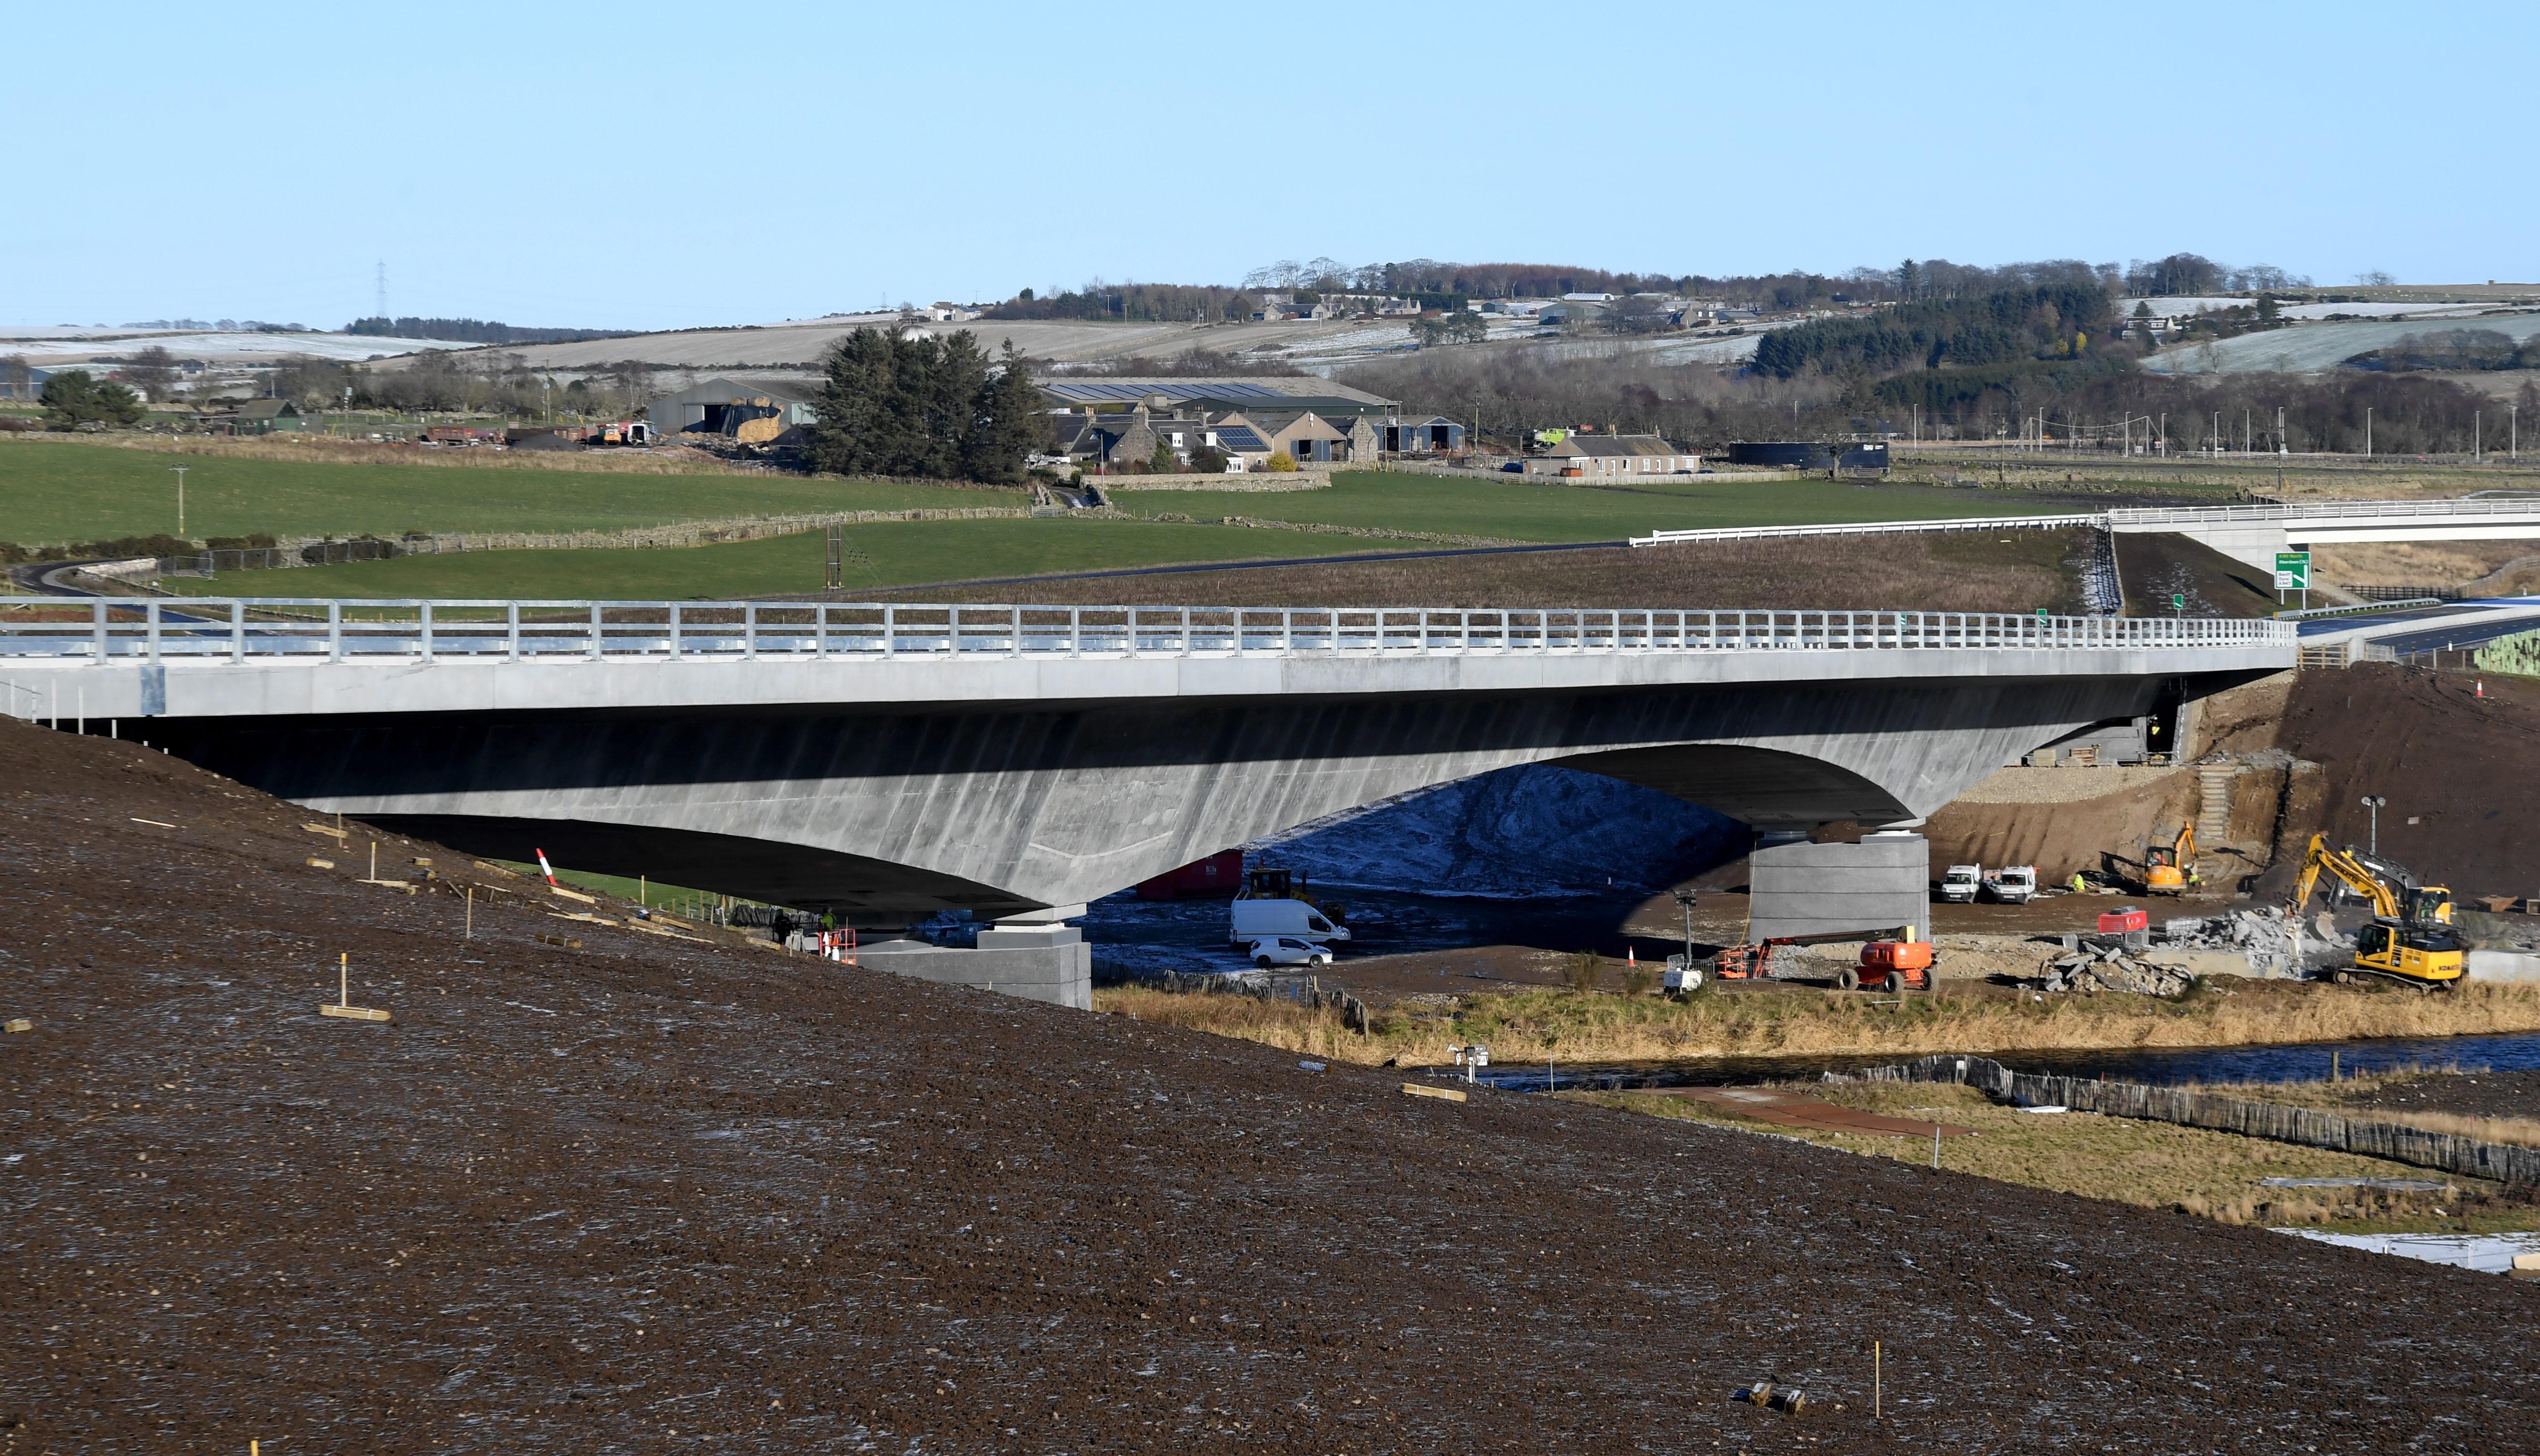 The AWPR bridge at Dyce.